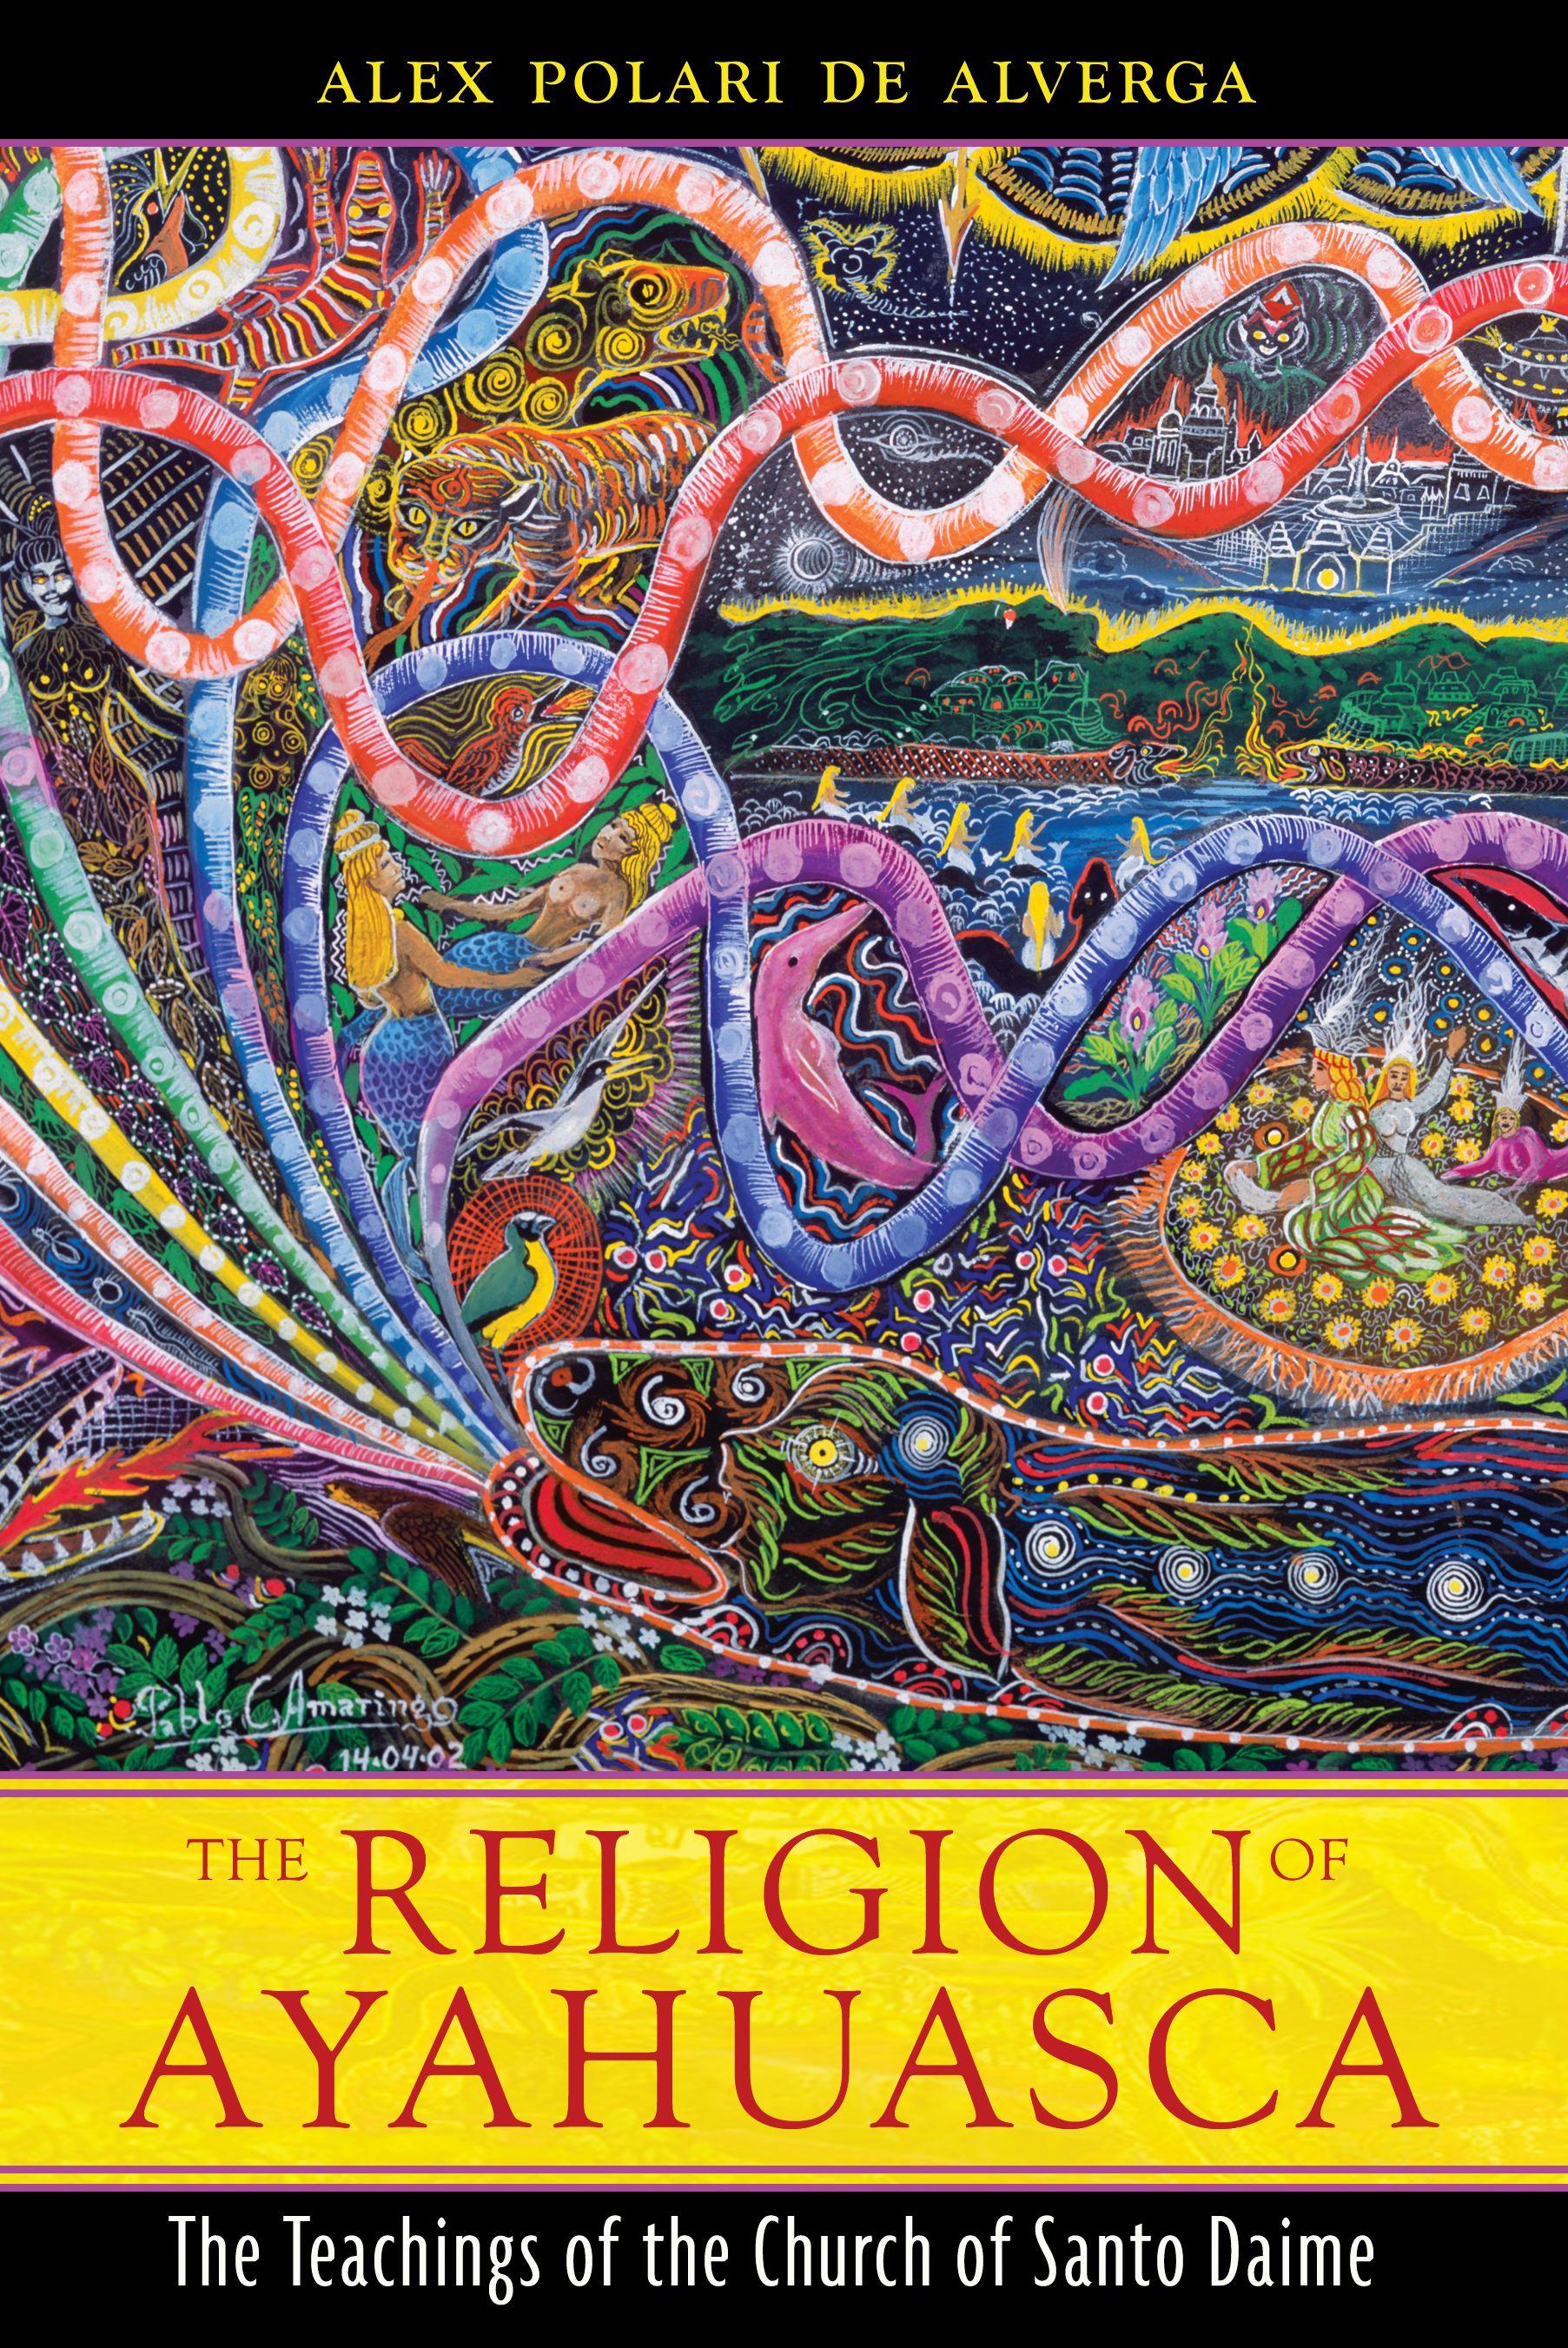 The Religion of Ayahuasca | Book by Alex Polari de Alverga